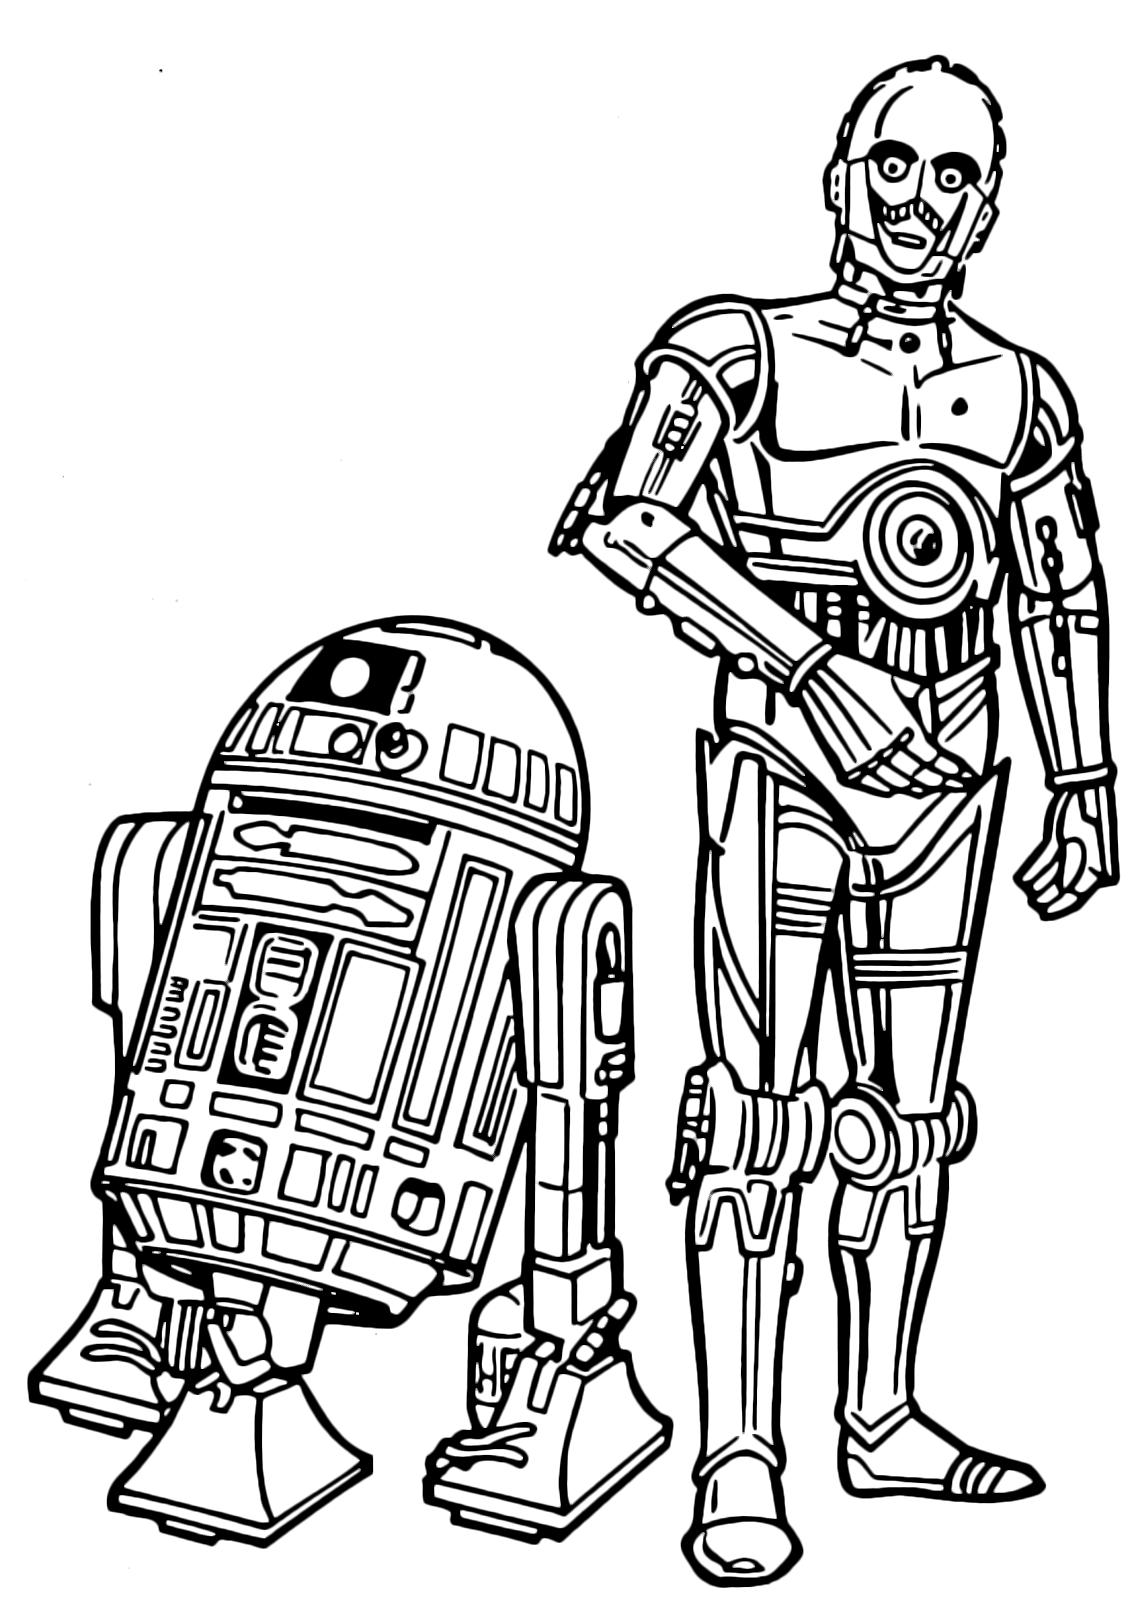 Star Wars - C-3PO e l'amico inseparabile C1-P8 Lego Star Wars R2d2 Coloring Pages